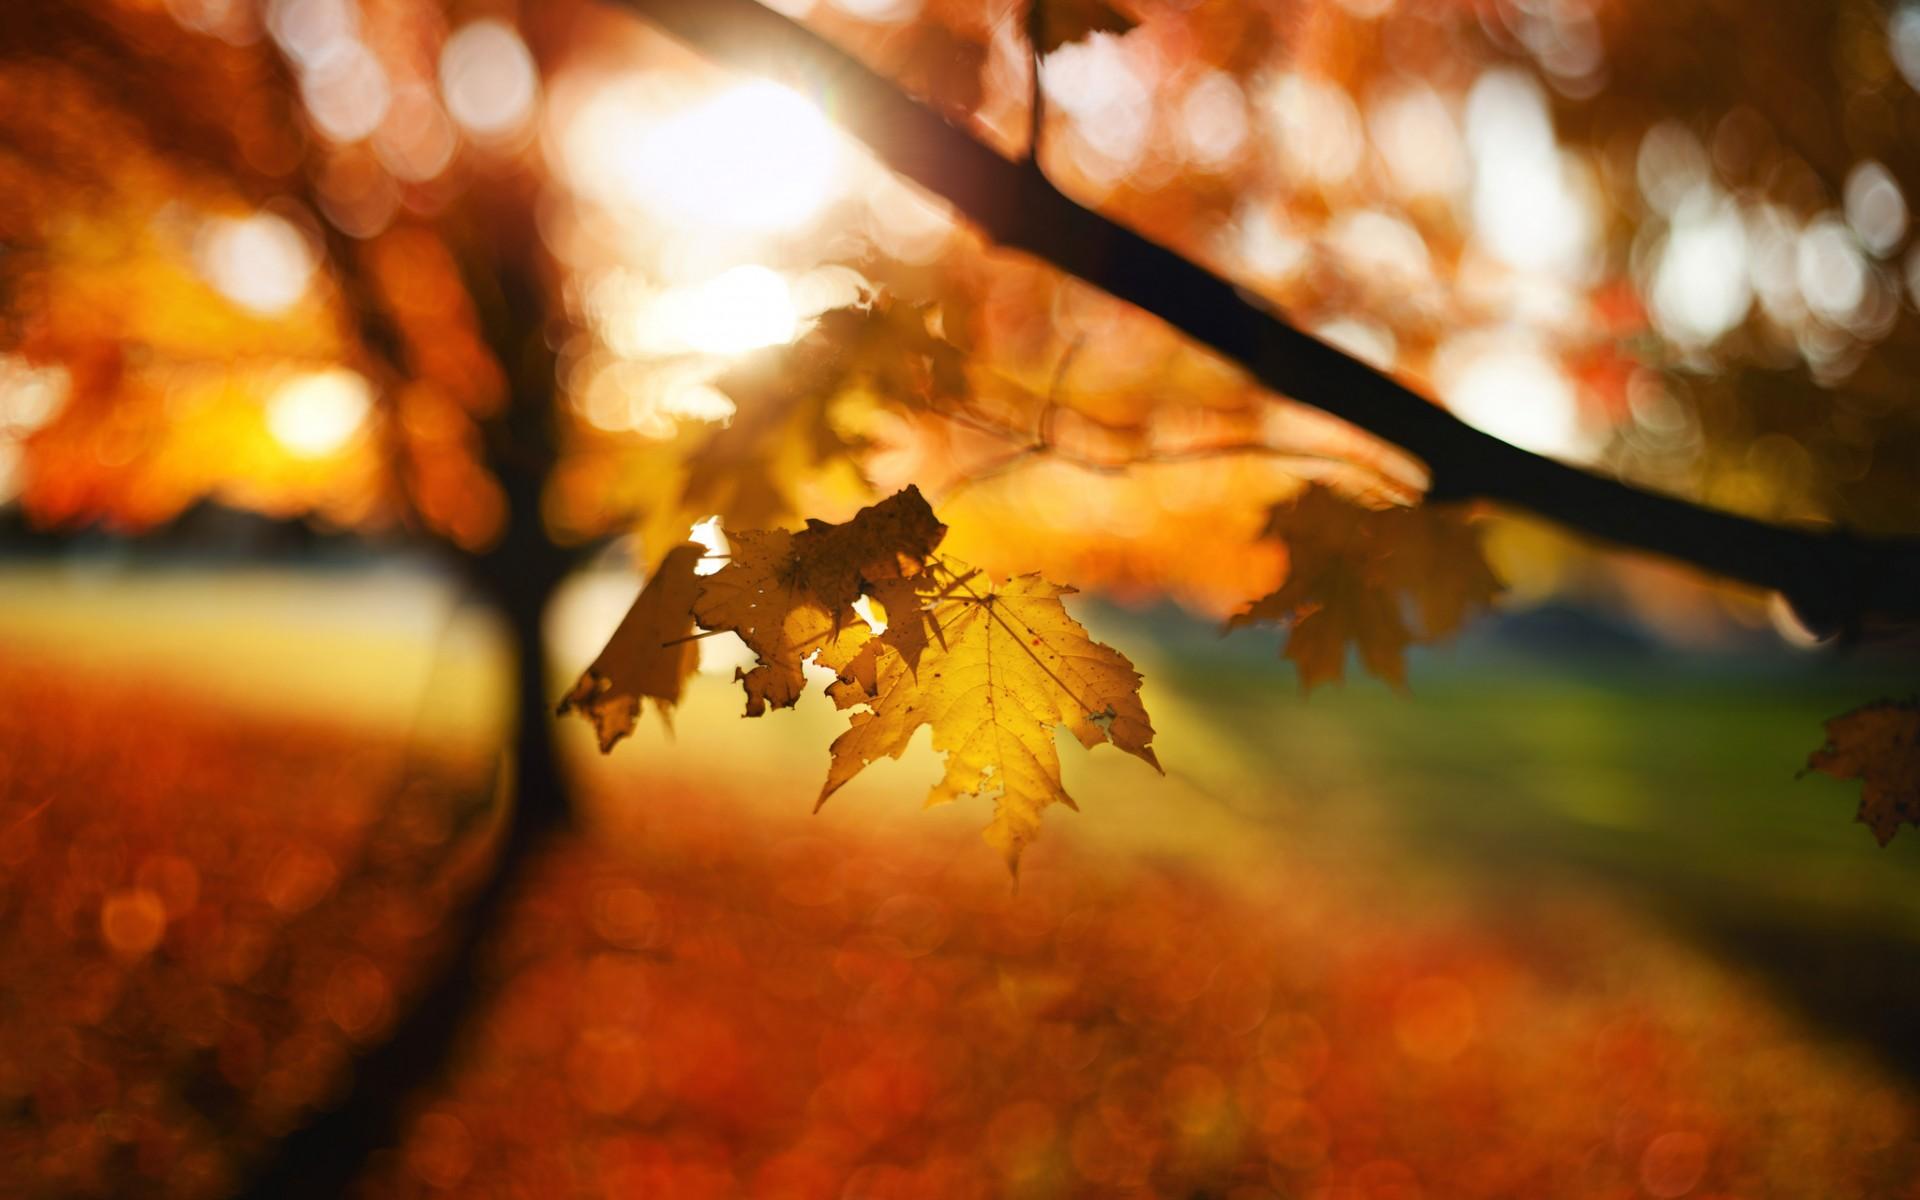 Free Wallpaper Downloads For Fall Leaves Autumn Bokeh Trees Wallpaper 1920x1200 48448